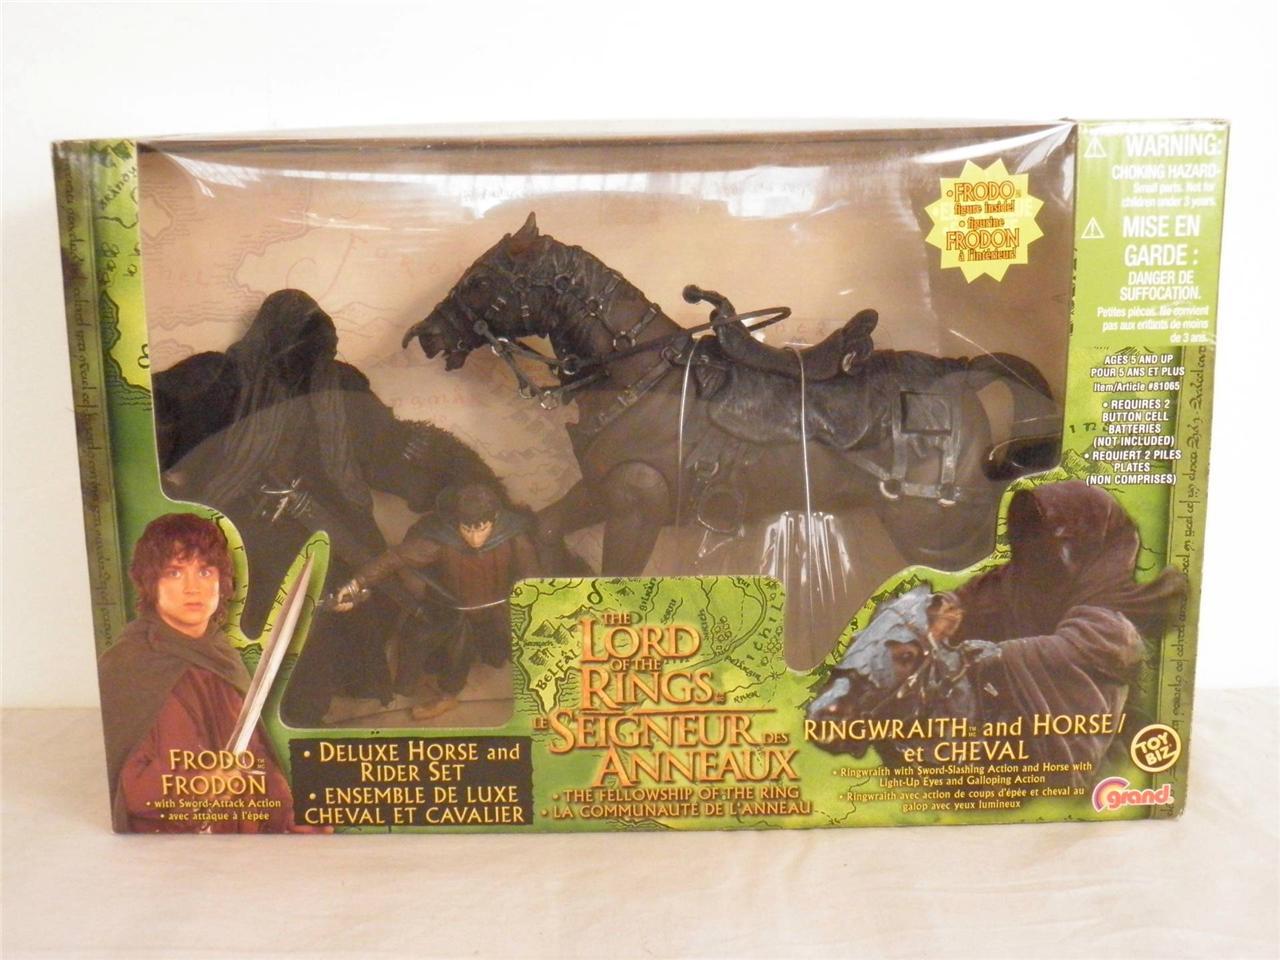 LOTR-FOTR-Ringwraith-Horse-with-bonus-Frodo-Deluxe-Box-Set-NIB-NEW-Toybiz-RARE